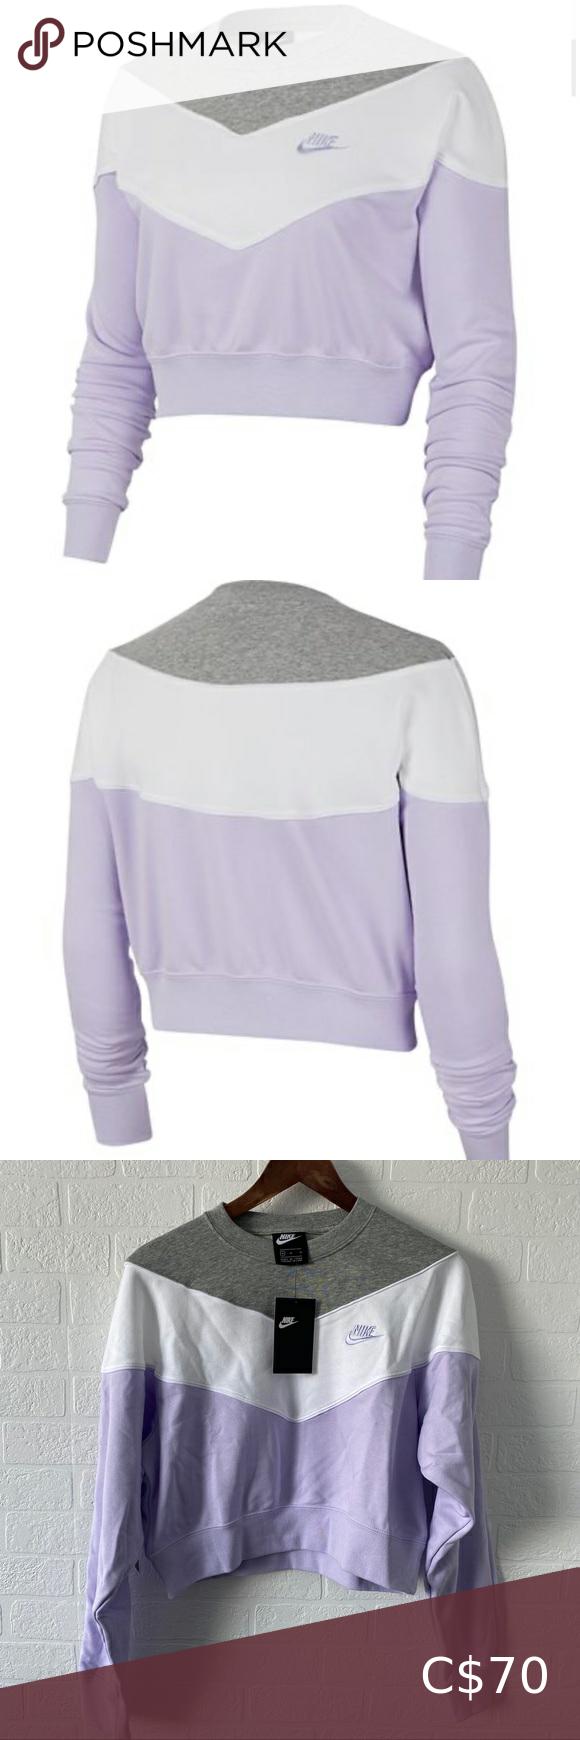 Price Drop Nwt Nike Cropped Loose Fit Sweatshirt Sweatshirts Workout Sweatshirt Loose Fitting [ 1740 x 580 Pixel ]